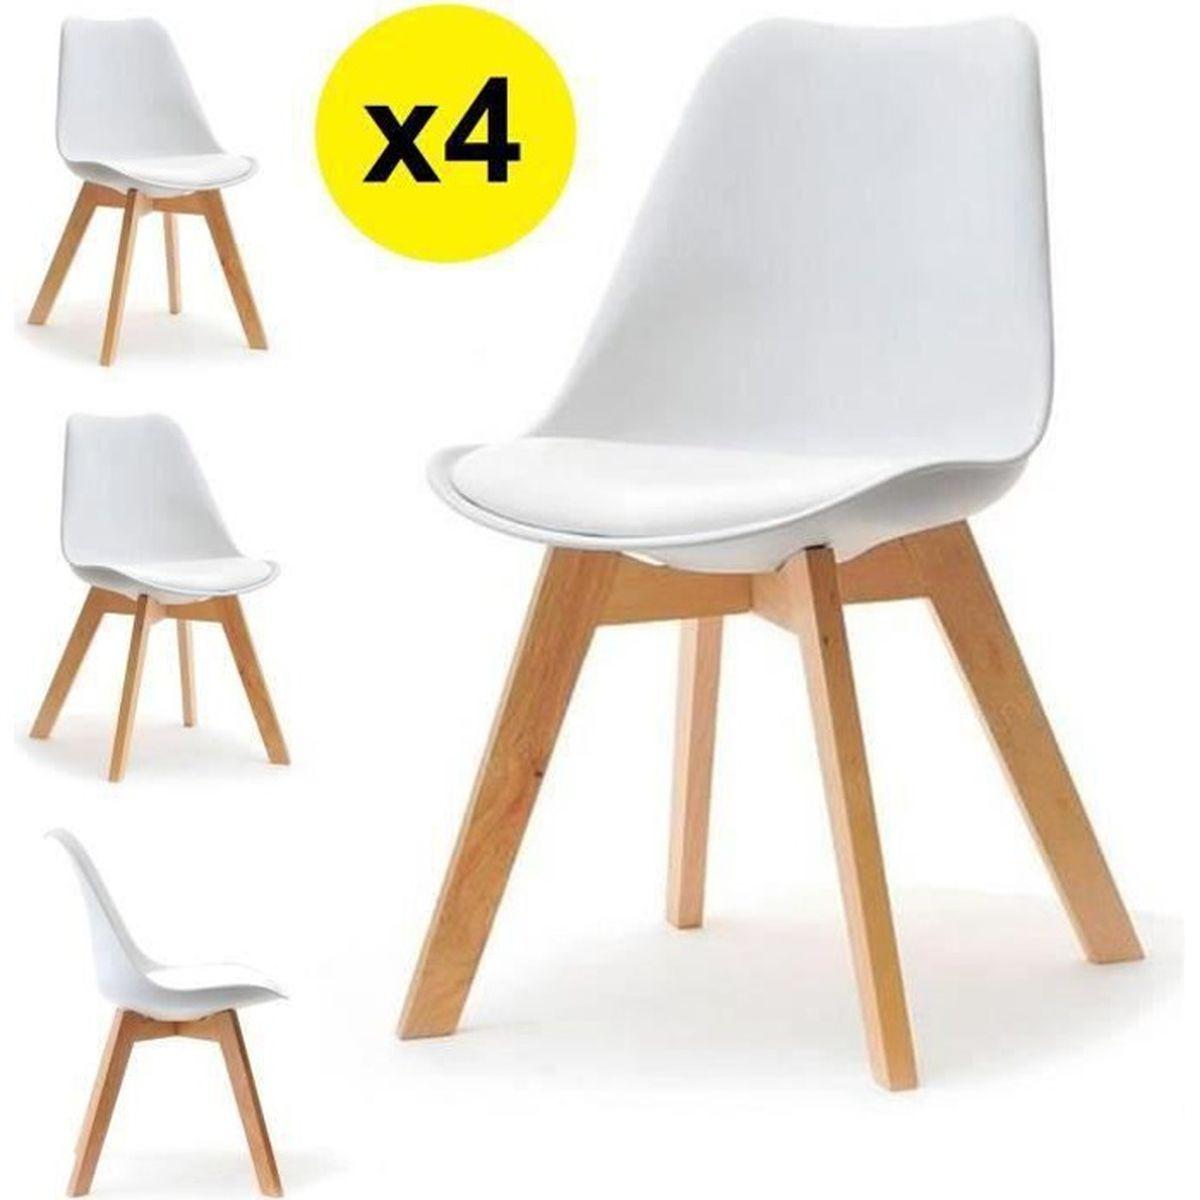 blanc coloris Skagen Lot 4 chaises scandinaves Style de nPwkX0O8